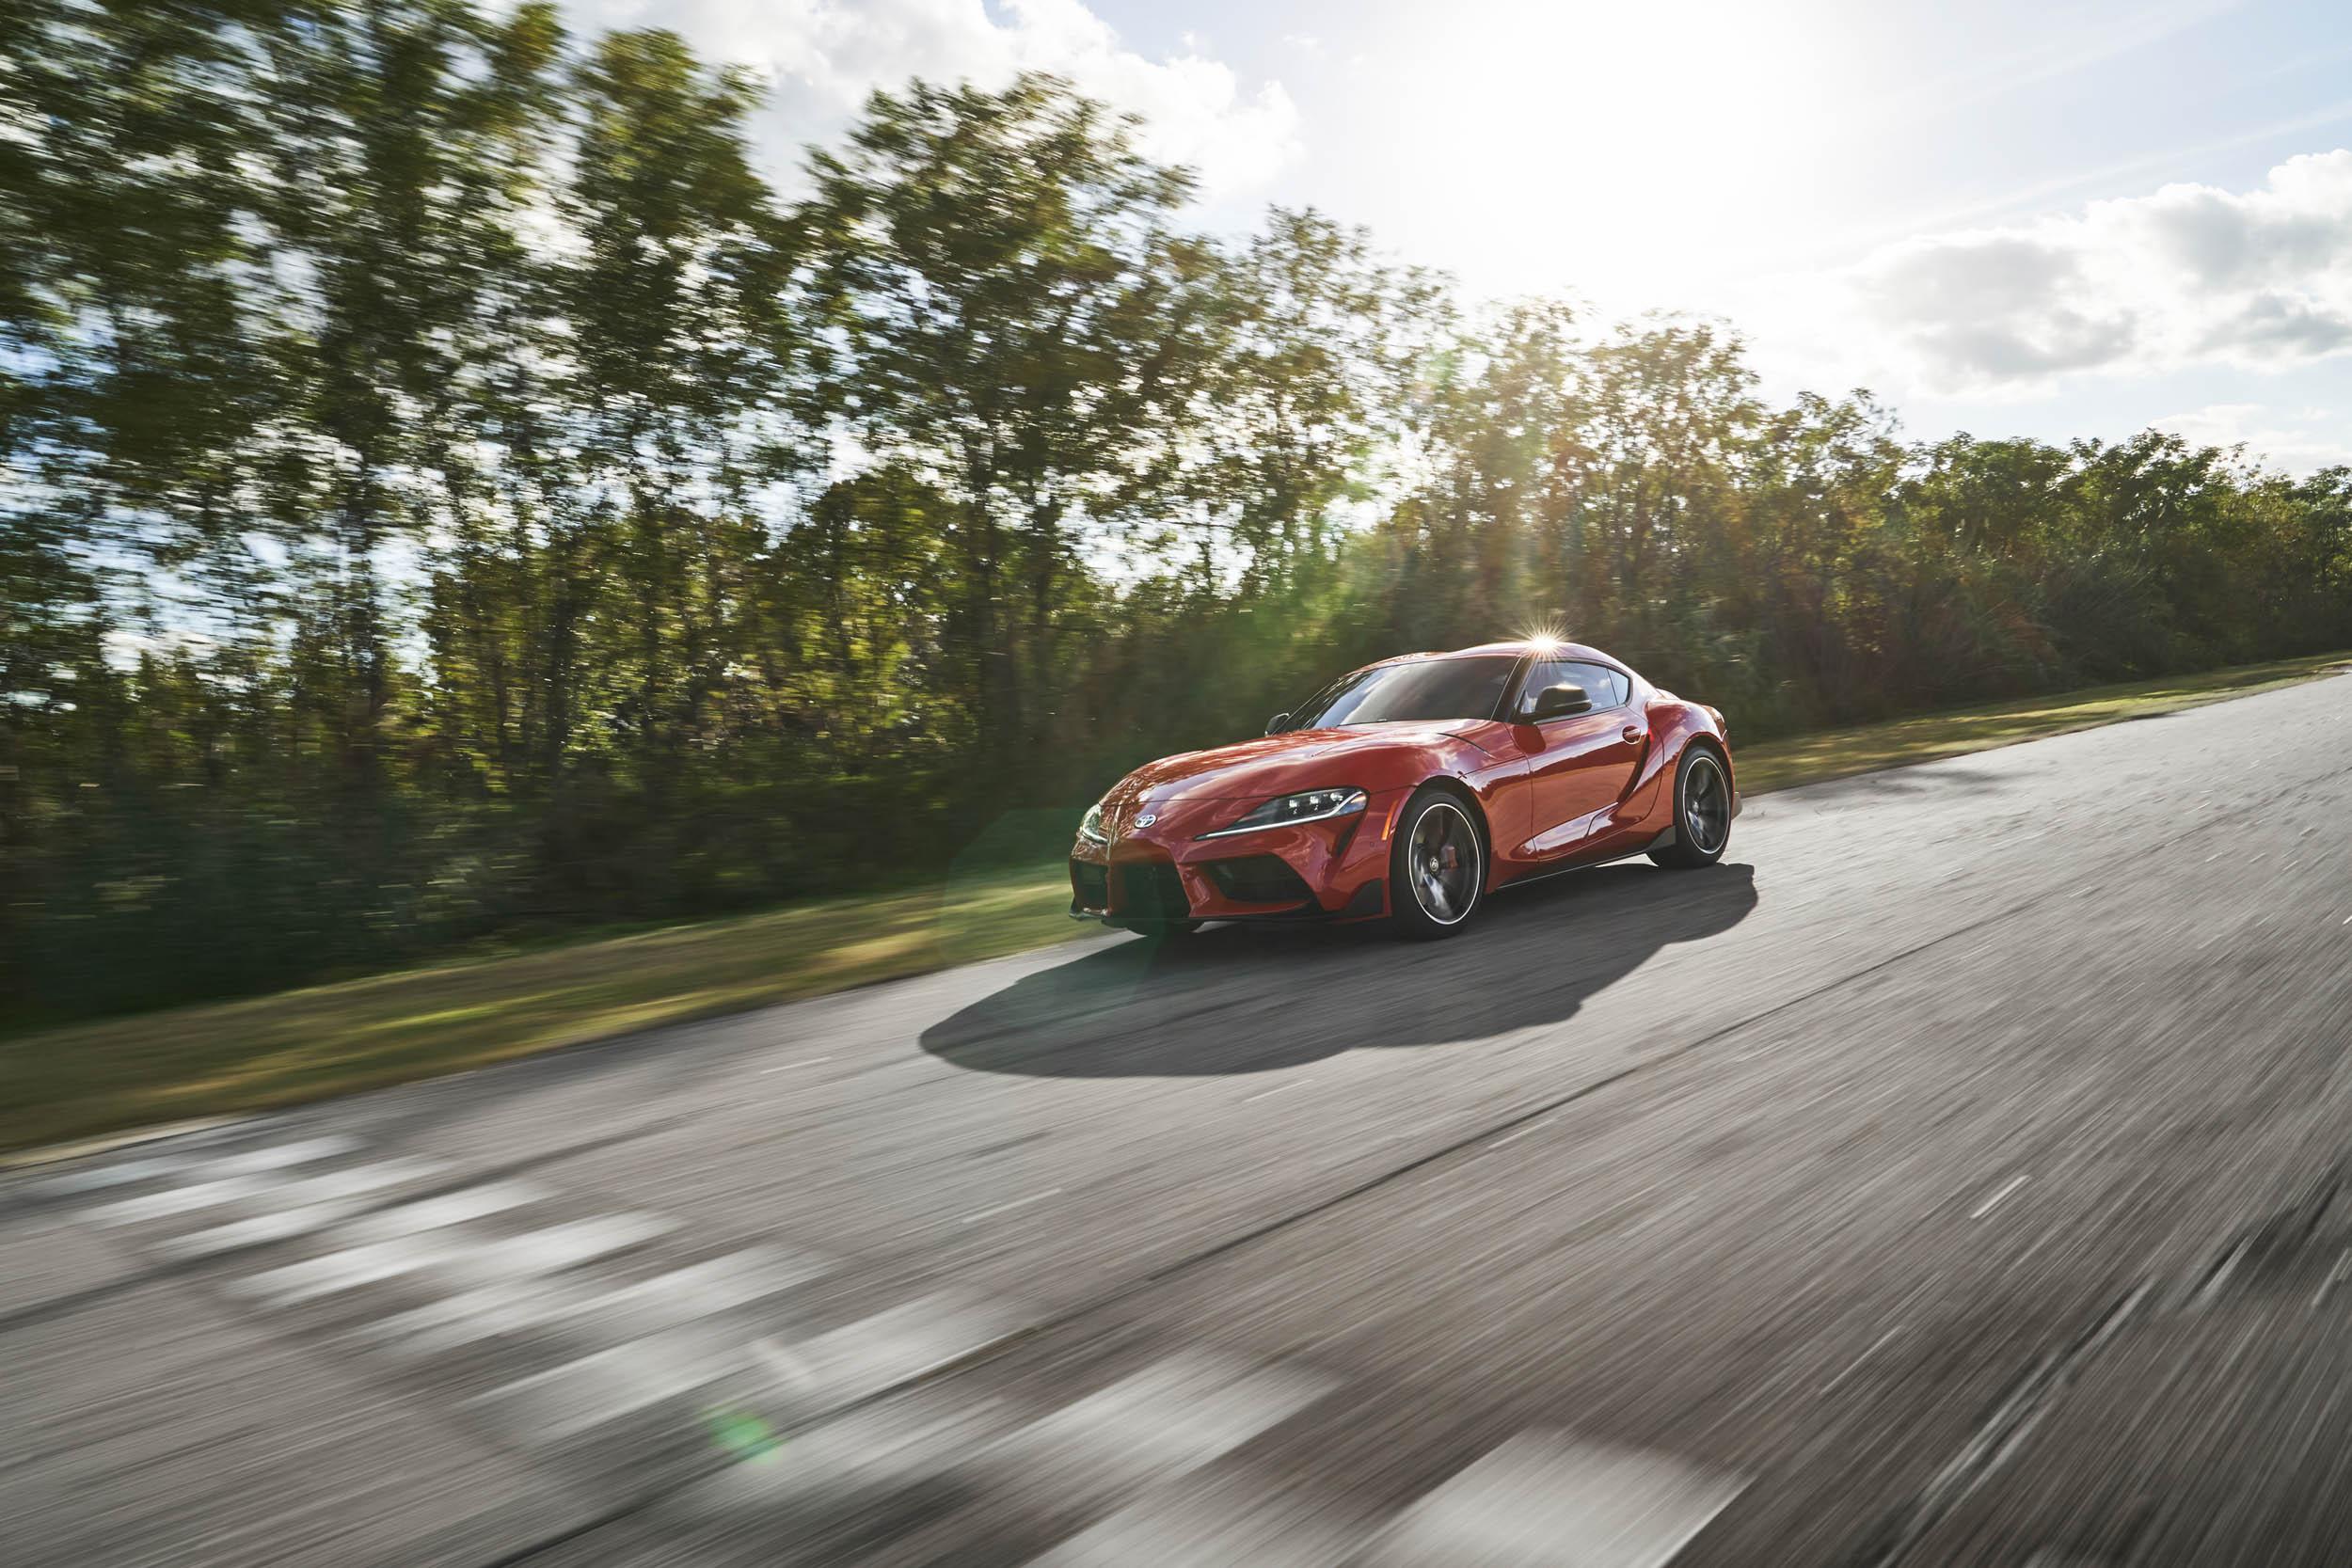 2020 Toyota Supra lens flare